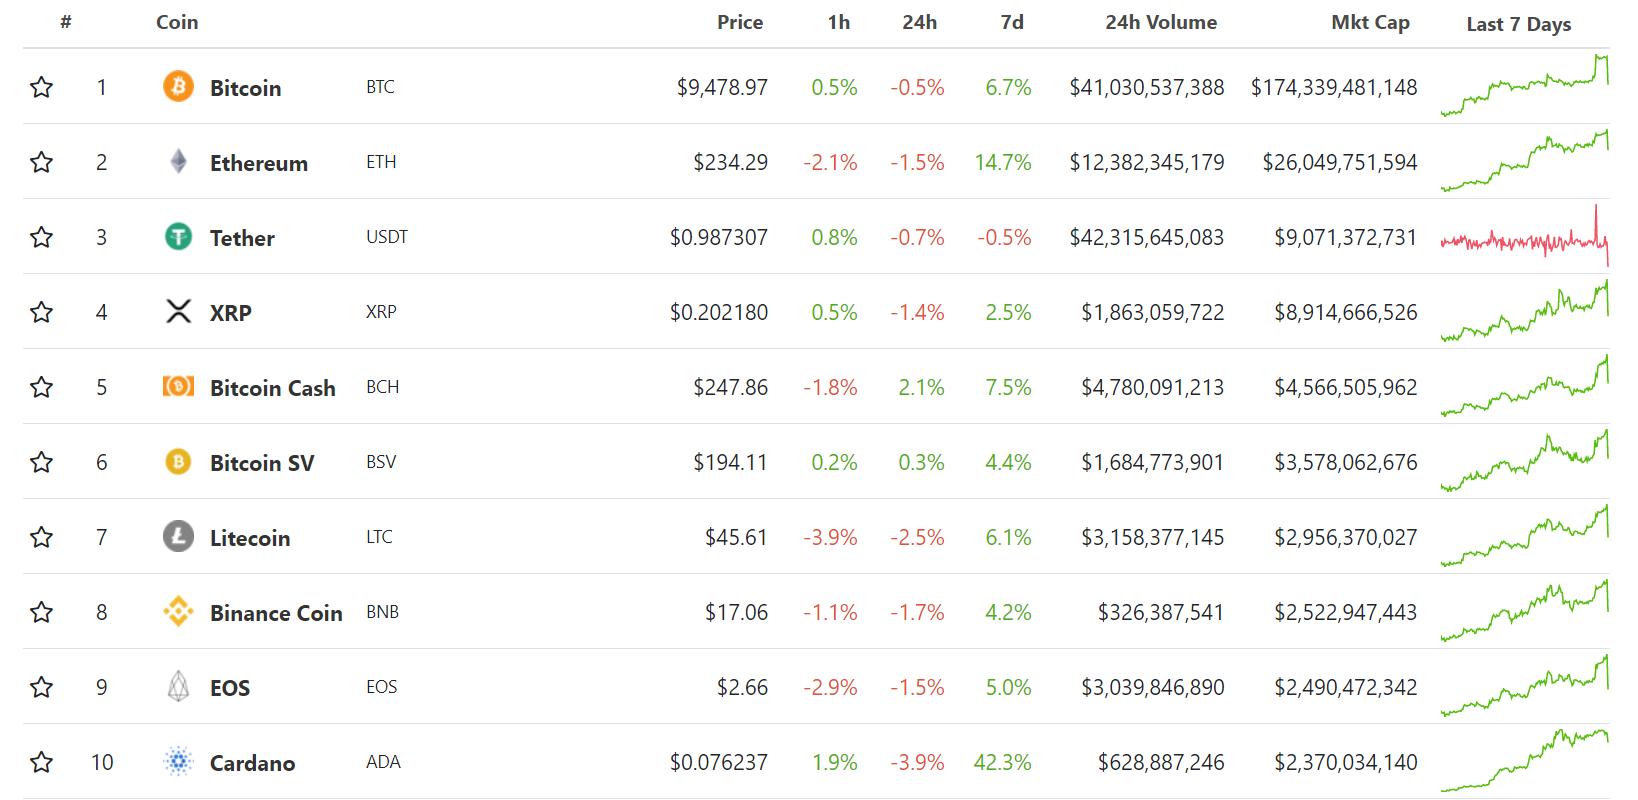 screenshot www.coingecko.com 2020.06.02 18 56 50 - Новое ралли биткоина завершилось резким падением до $9100